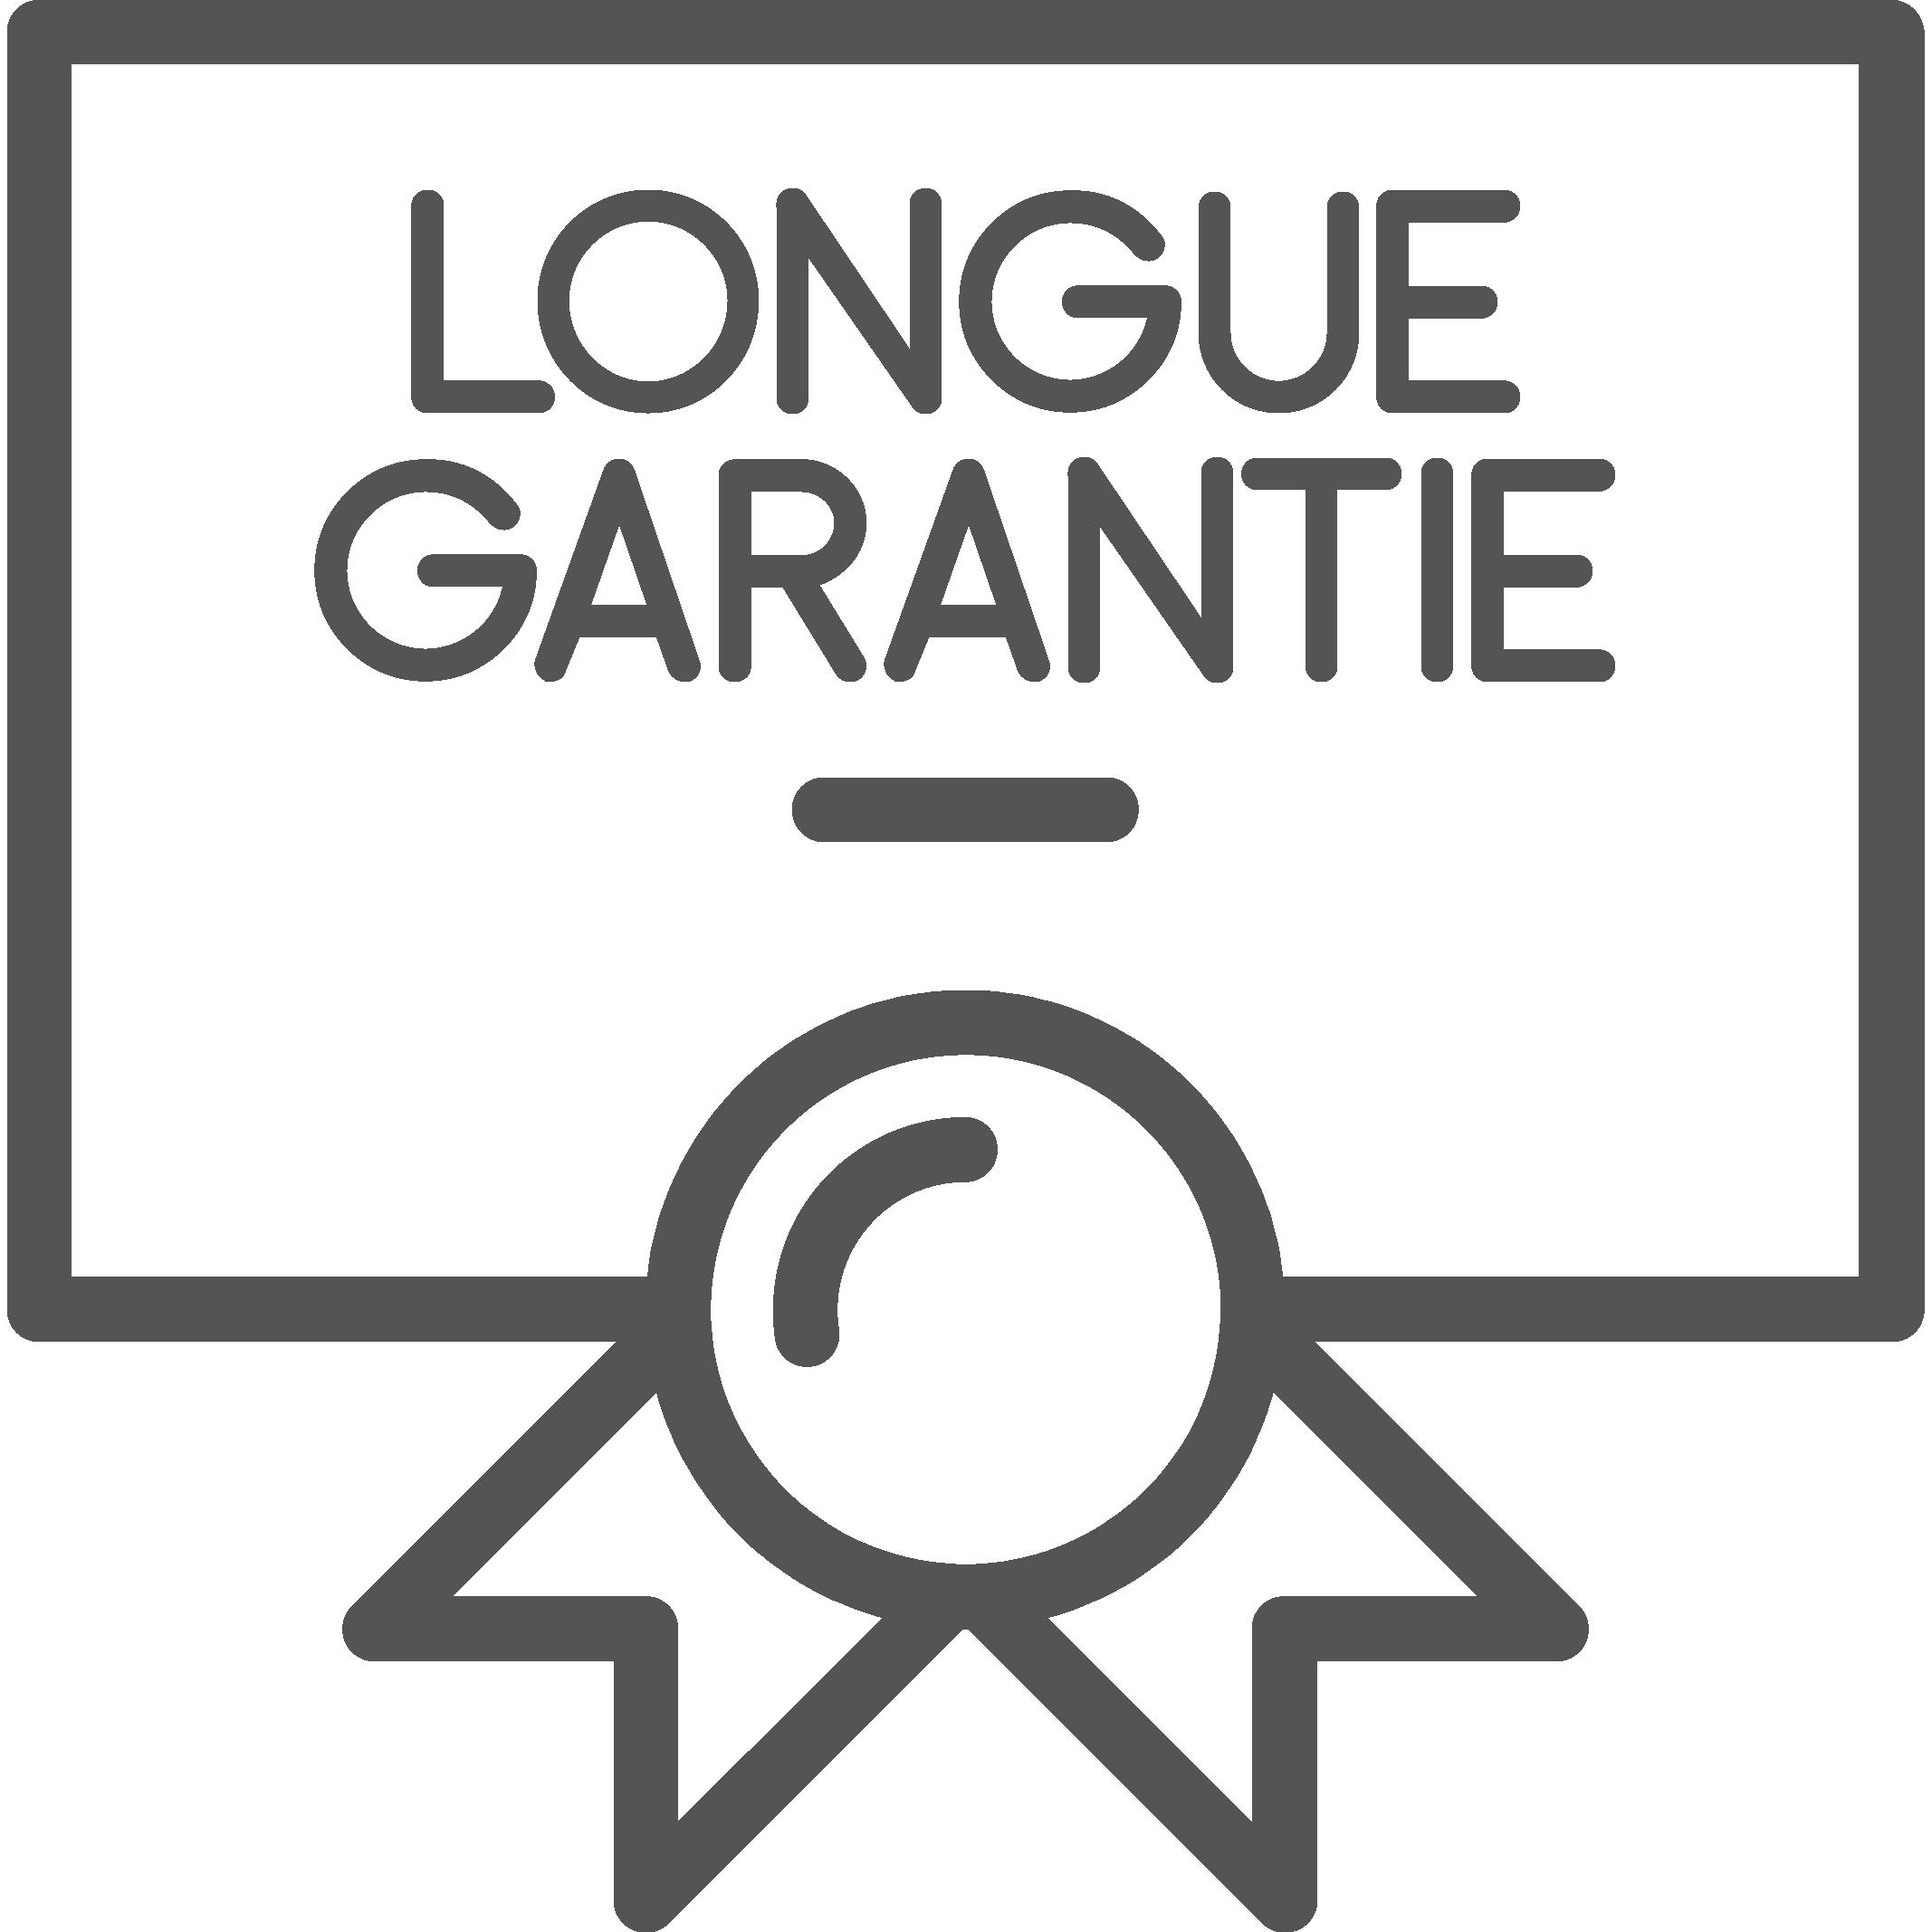 Operene_travaux de renovation garantie longue